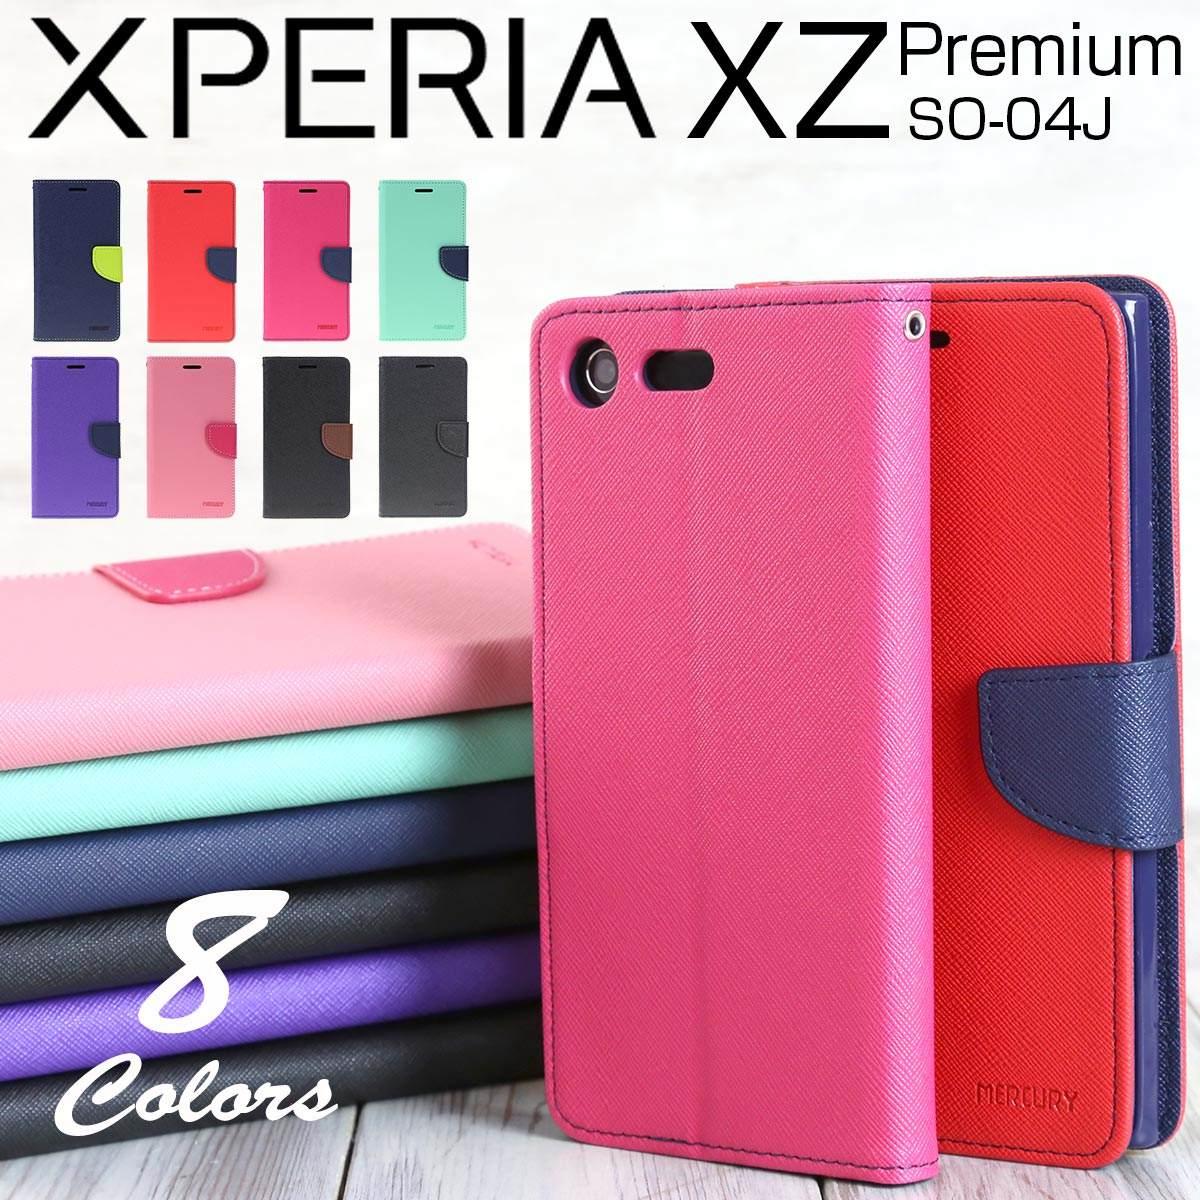 Xperia XZ Premium SO-04J コンビネーションカラー手帳型ケース|エクスペリアXZ プレミアム 手帳 カード入れ ツートン カラフル スマートフォン ケース カバー スマホ ケース カバー スマホ スマフォ 送料無料